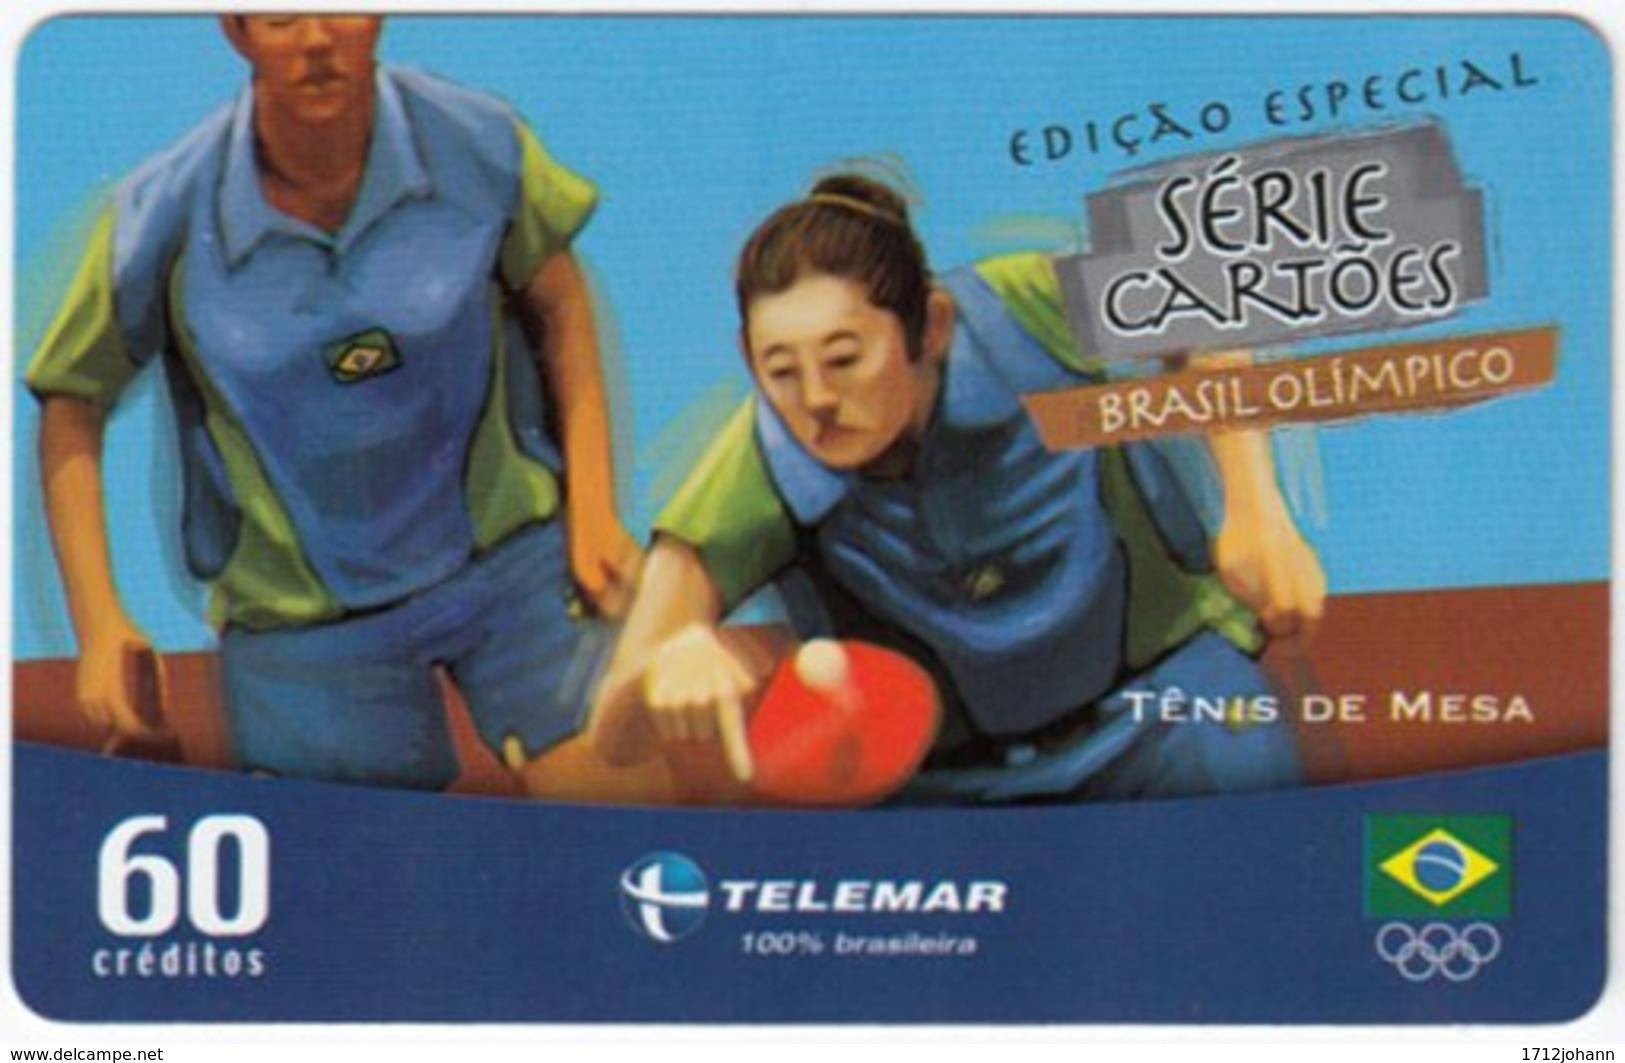 BRASIL G-473 Magnetic Telemar - Event, Olympic Games, Table Tennis - Used - Brasilien